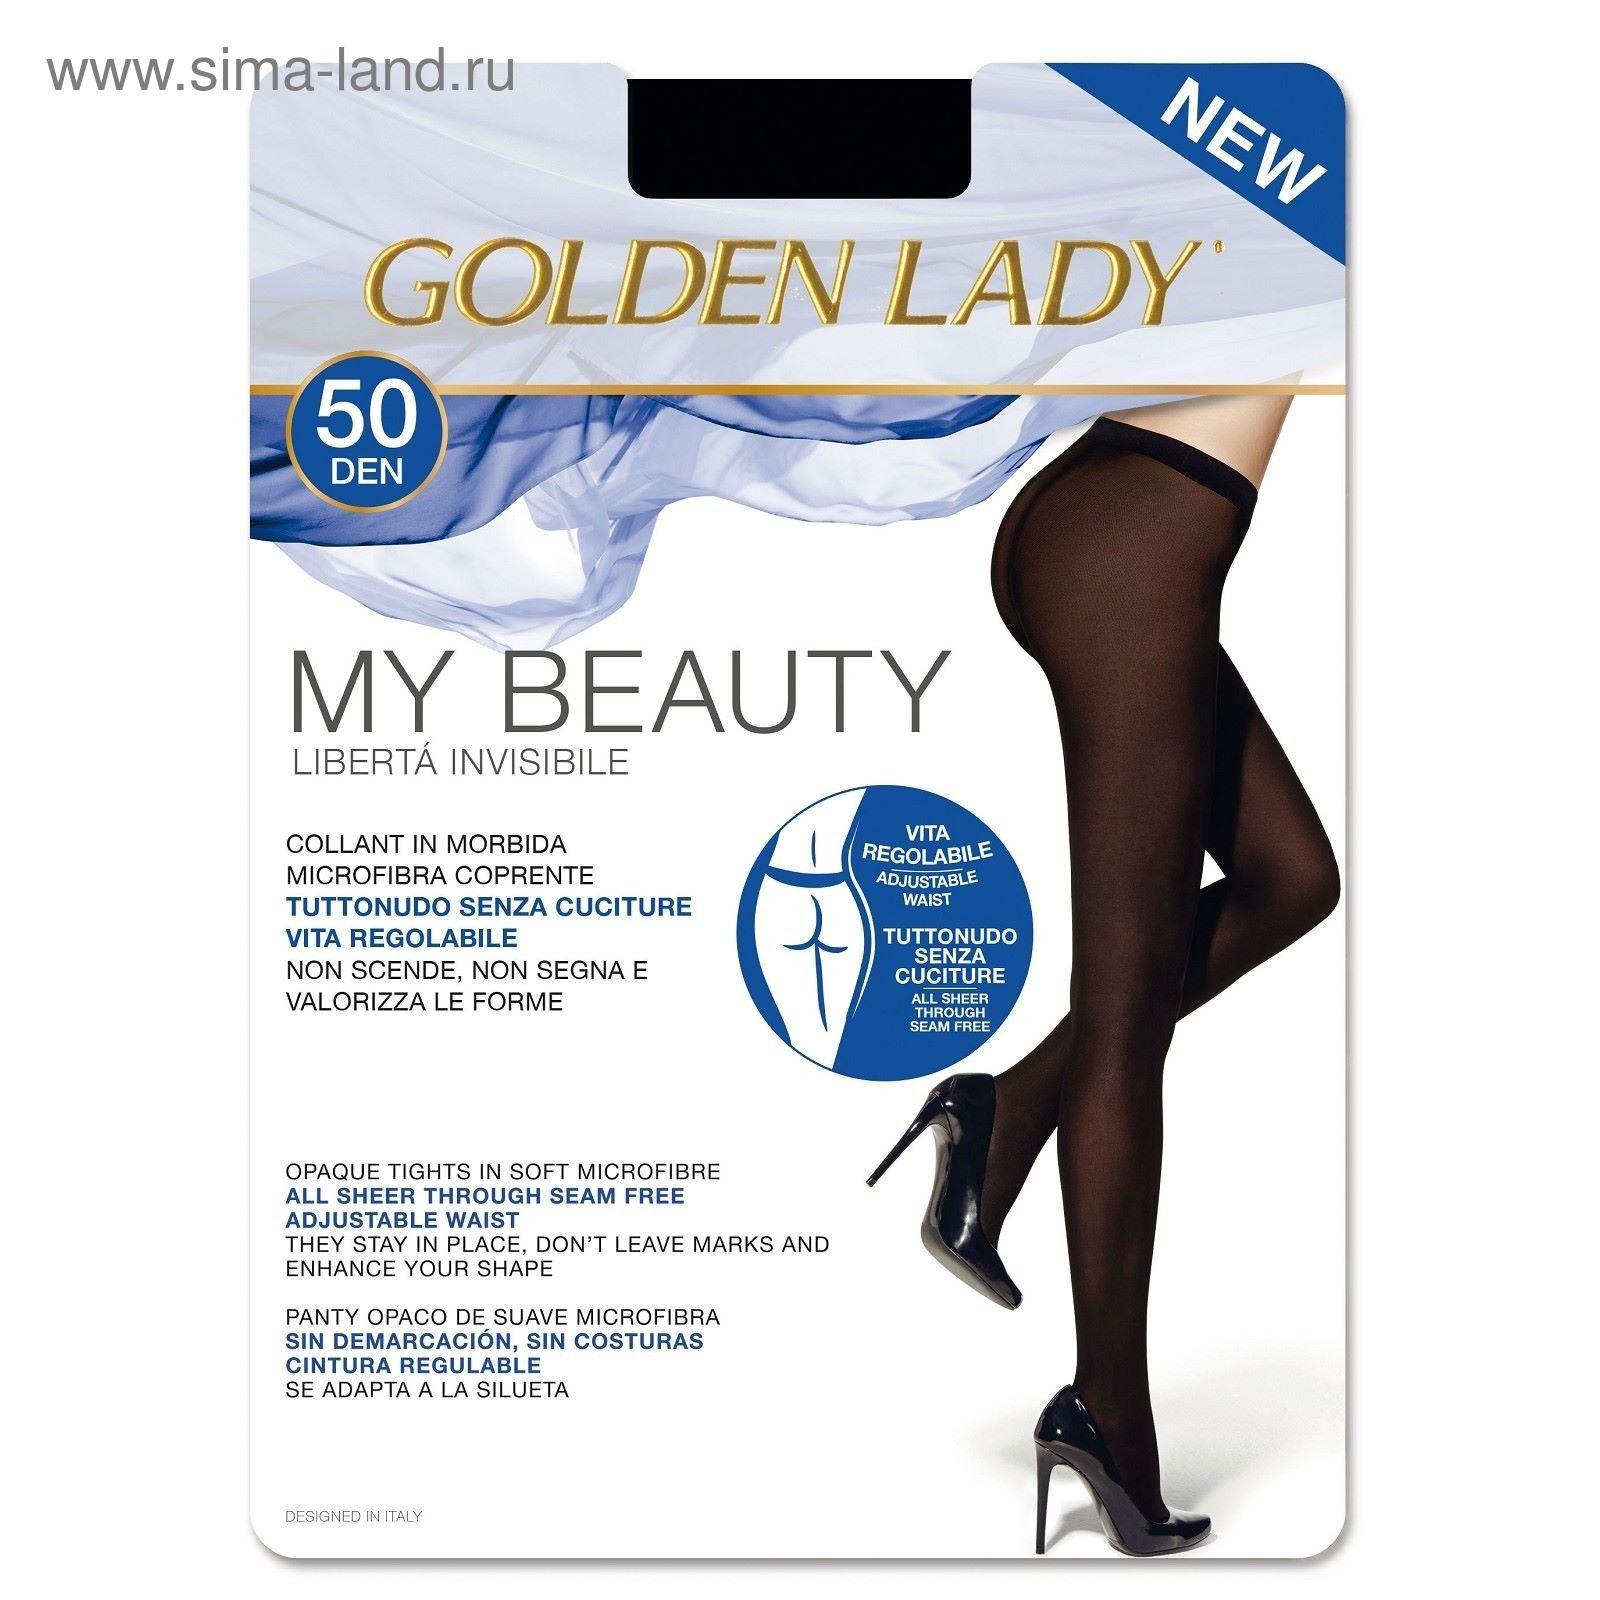 Golden lady shop online